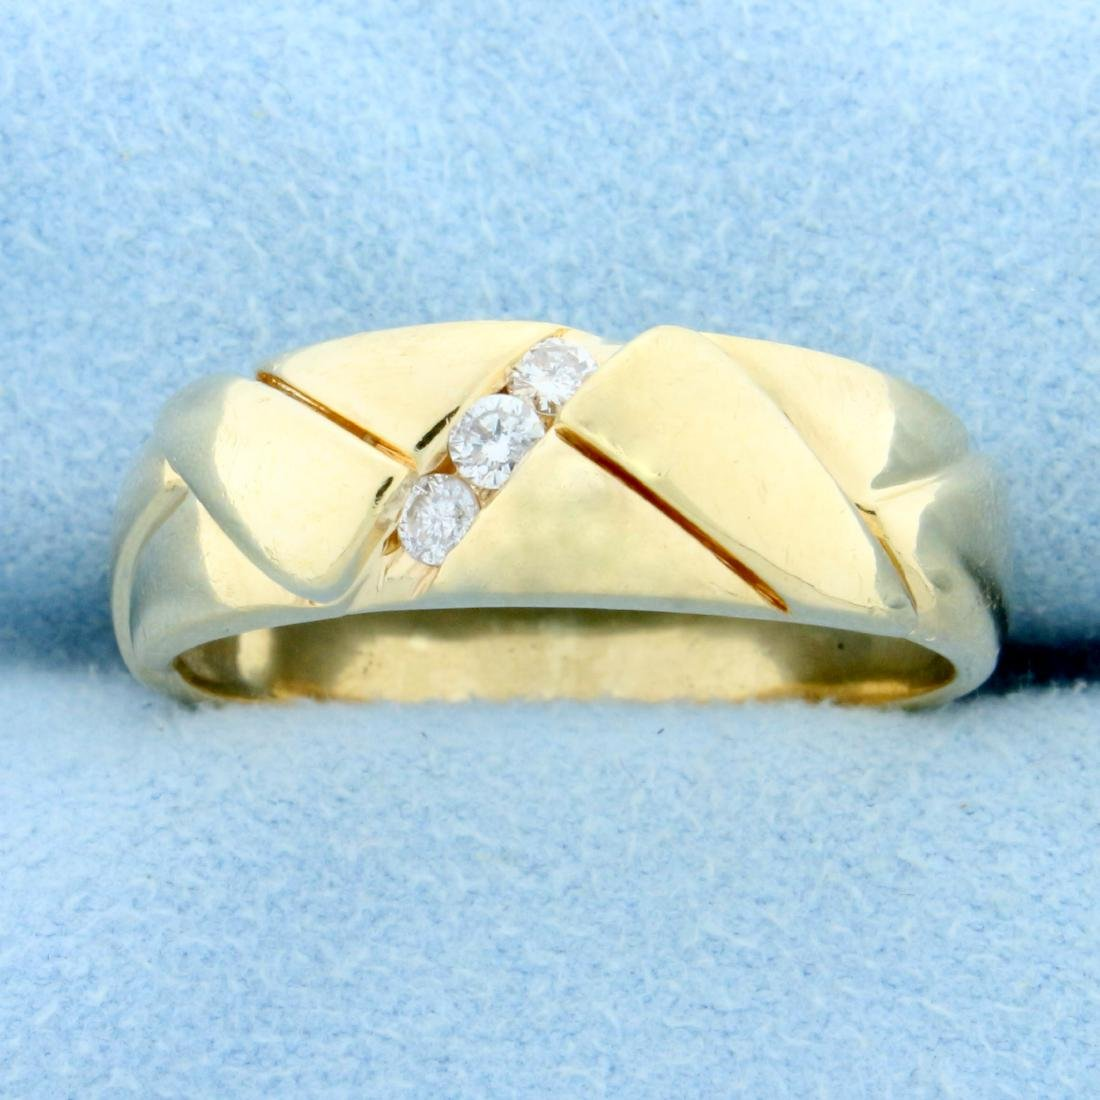 Men's Diamond Wedding or Anniversary Band Ring in 14K